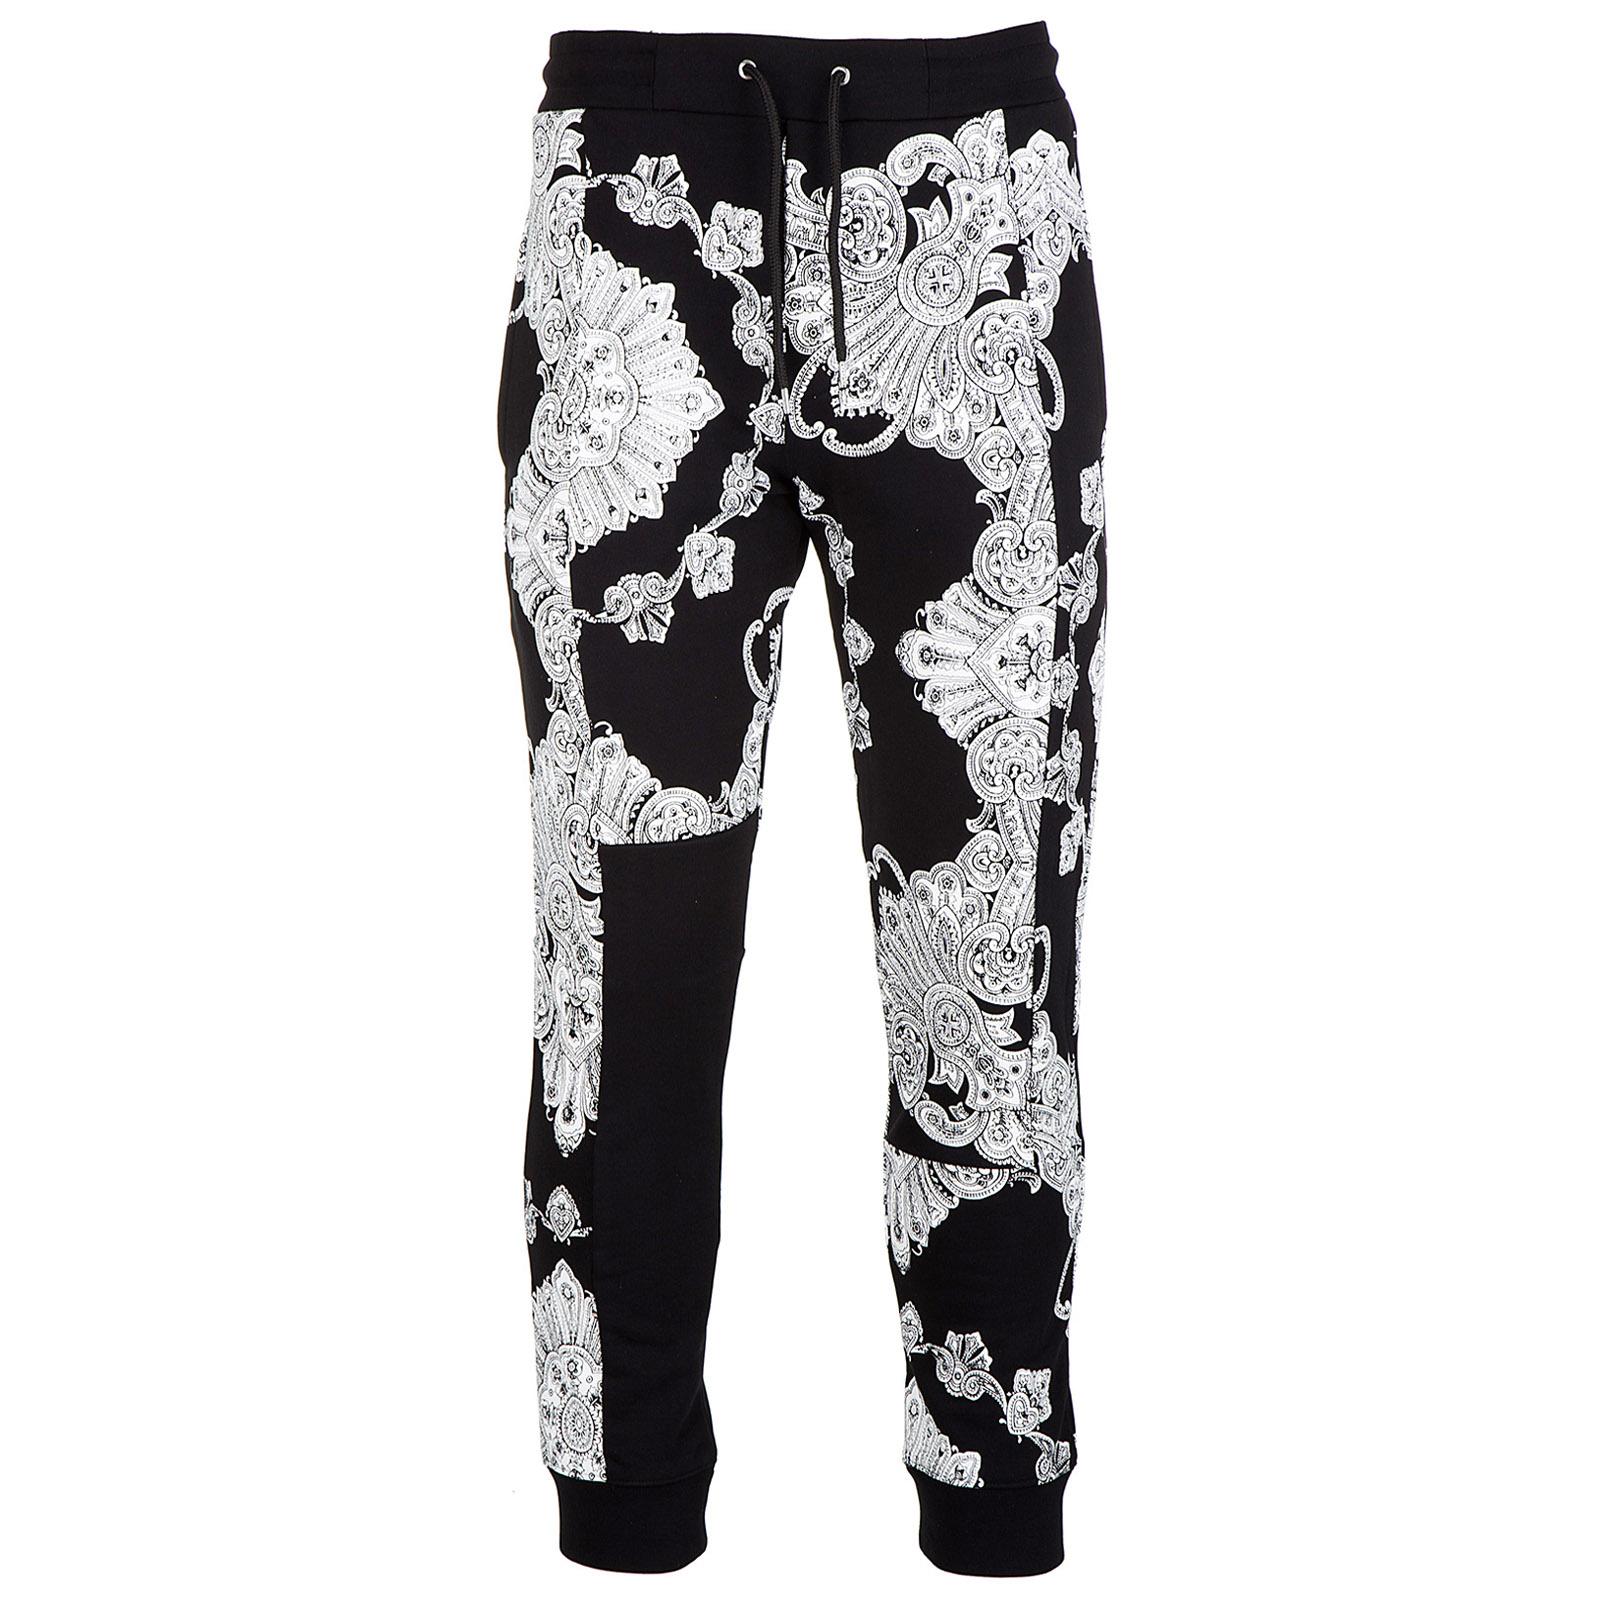 Pantalones deportivos hombre phoenix